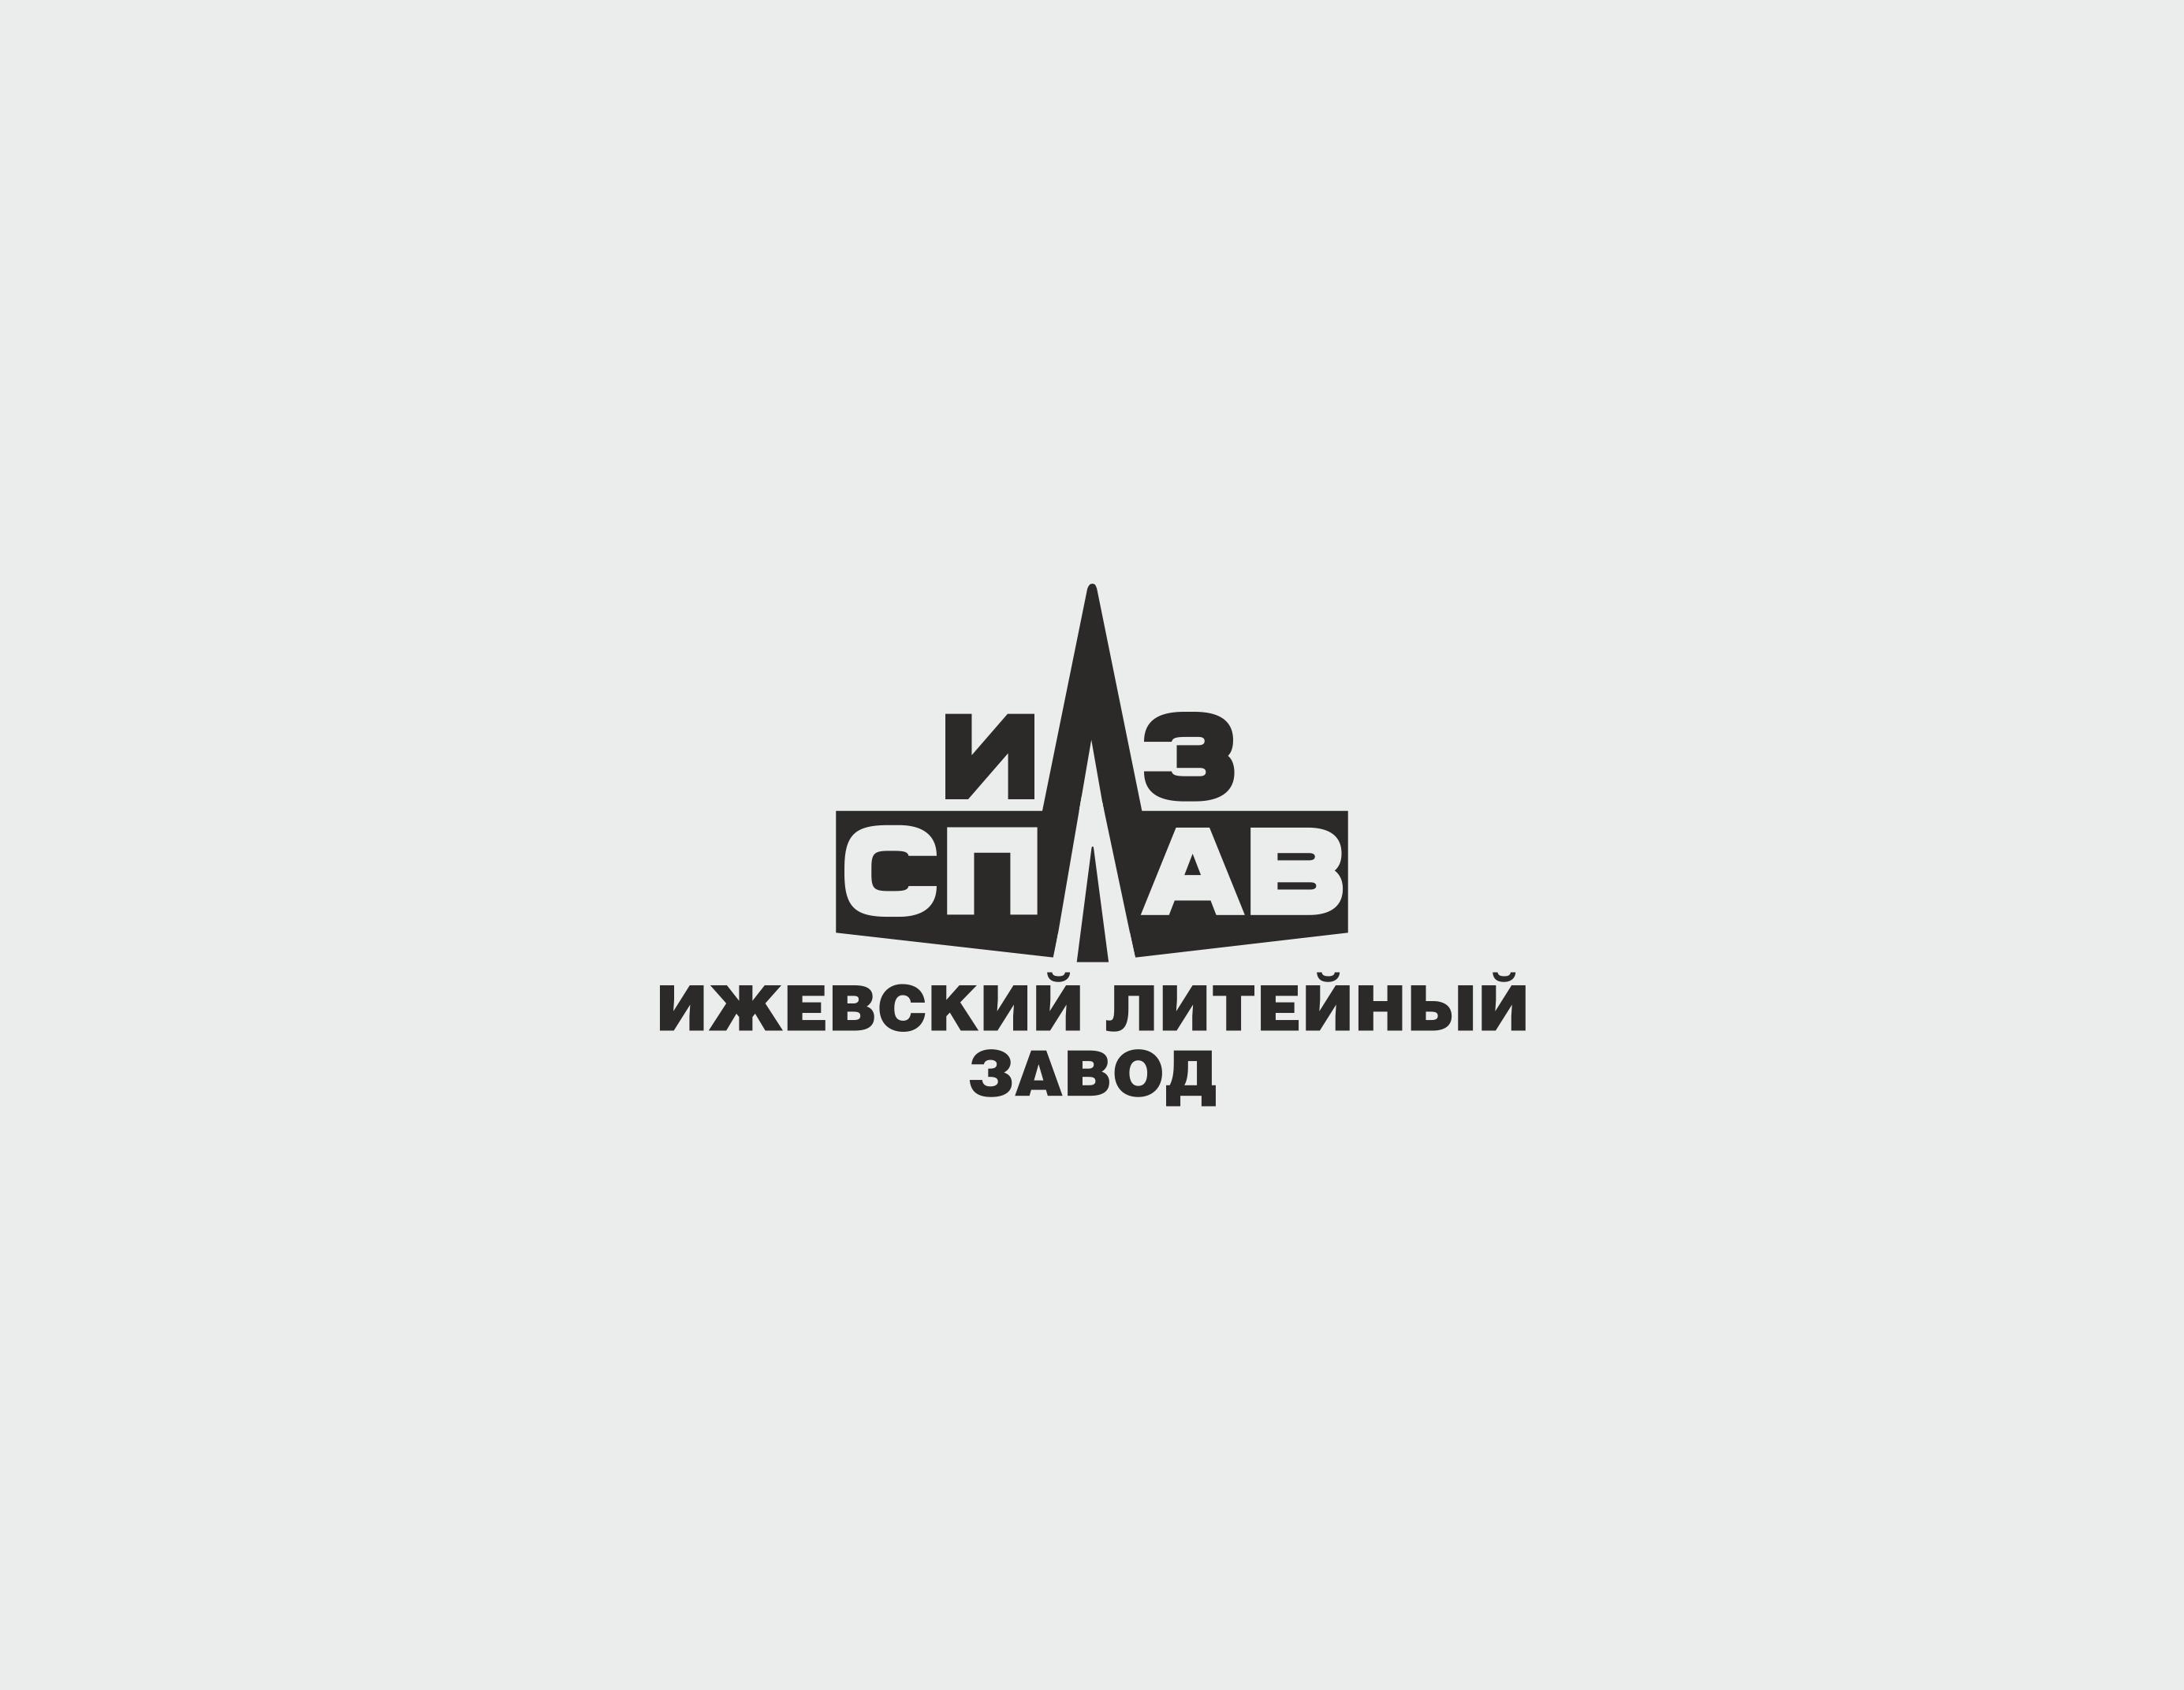 Разработать логотип для литейного завода фото f_4295b15496505da8.png